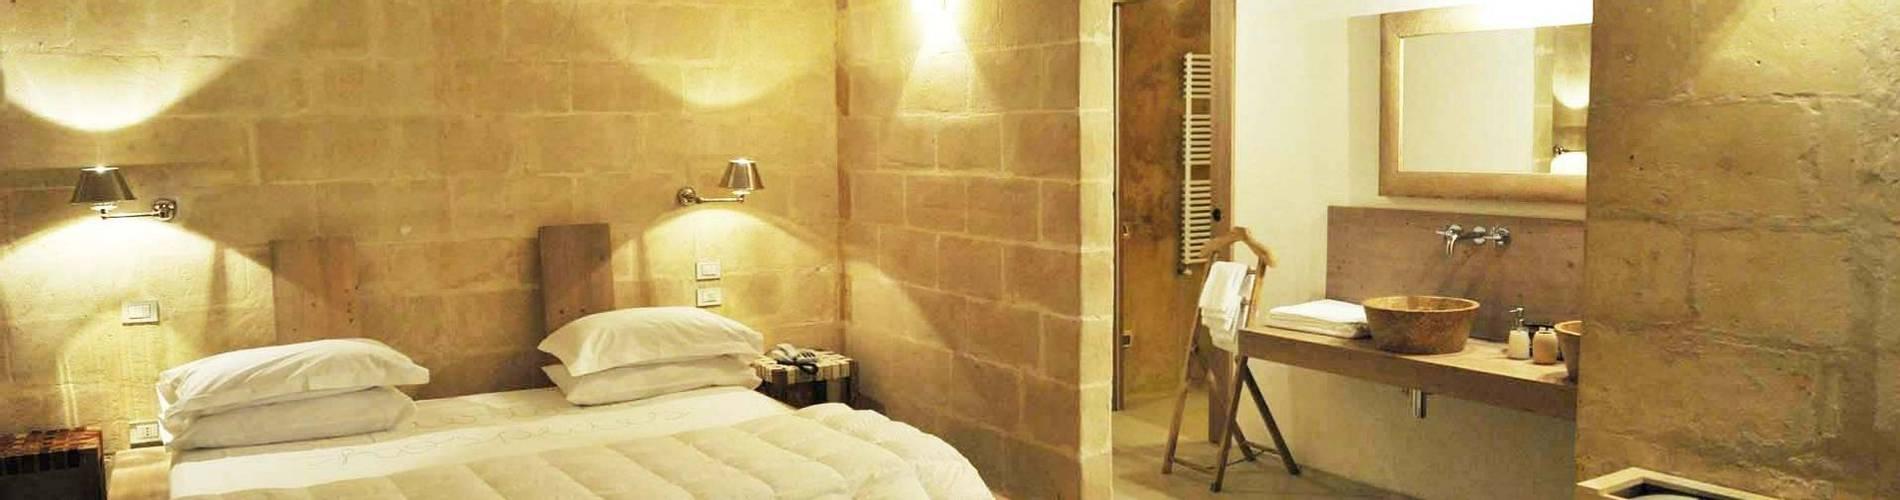 L'Hotel In Pietra, Basilicata, Italy, Deluxe Room 1005 (2).jpg